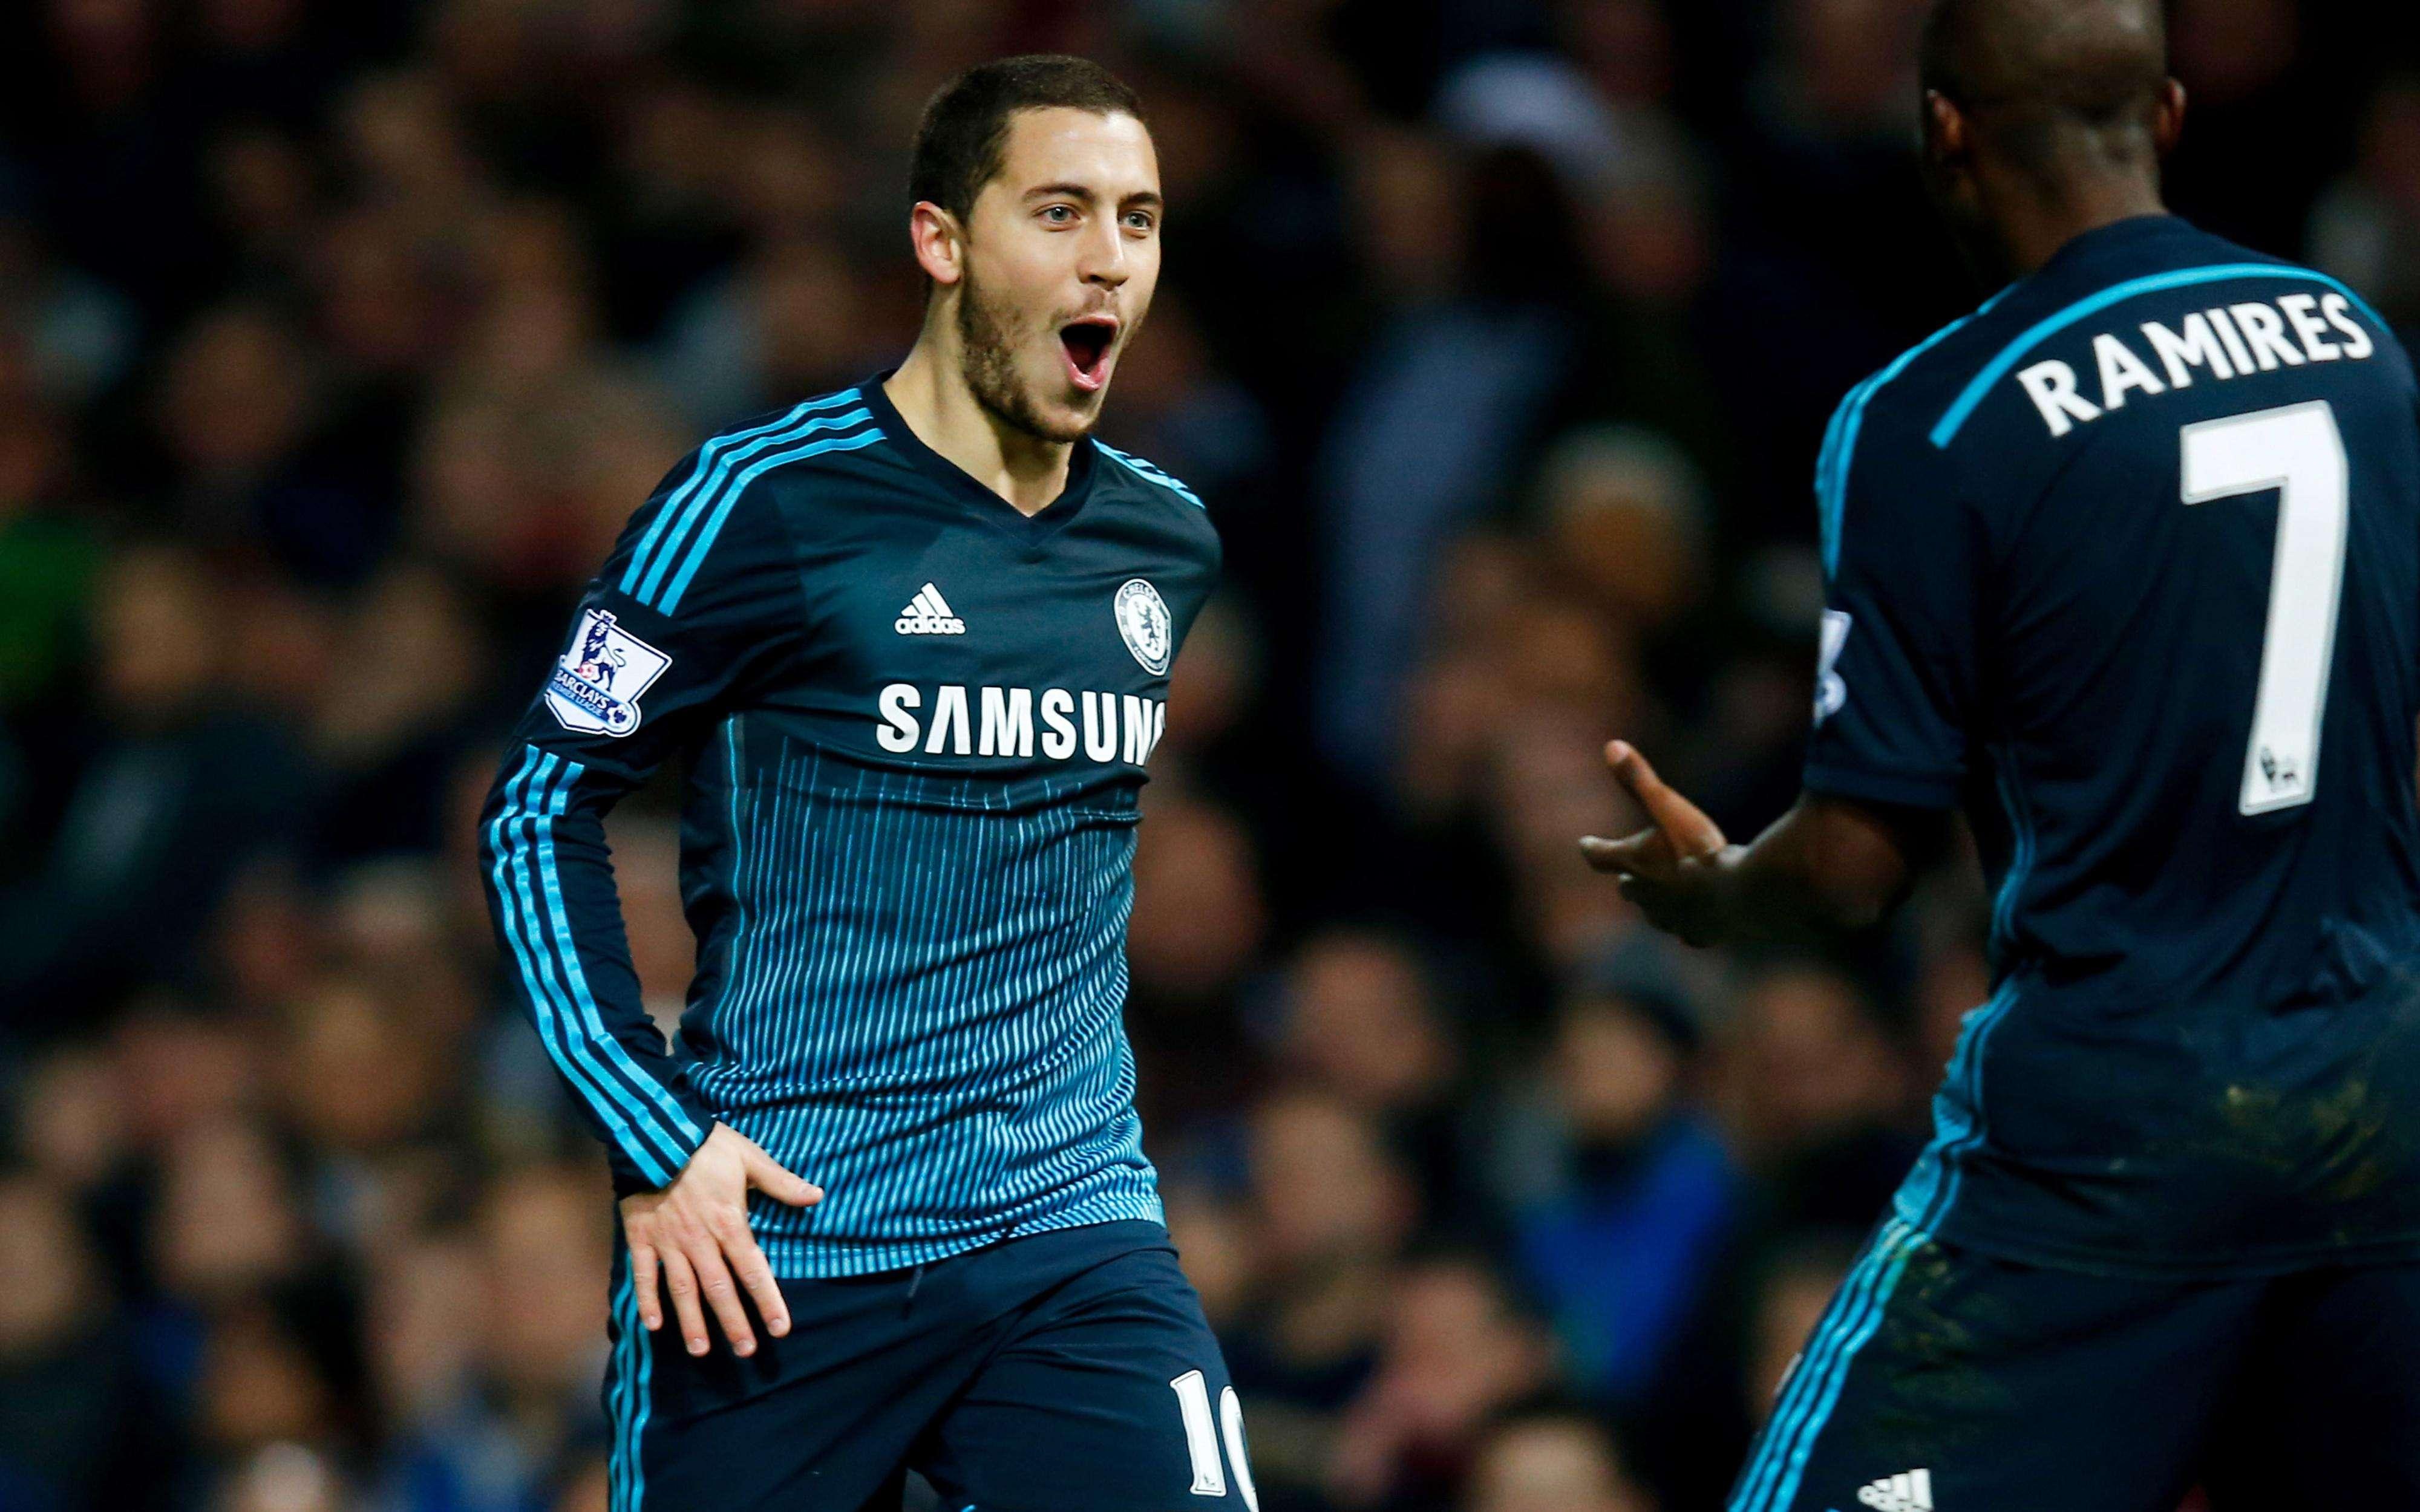 Eden Hazard celebra el gol del triunfo de Chelsea sobre West Ham United. Foto: Getty Images